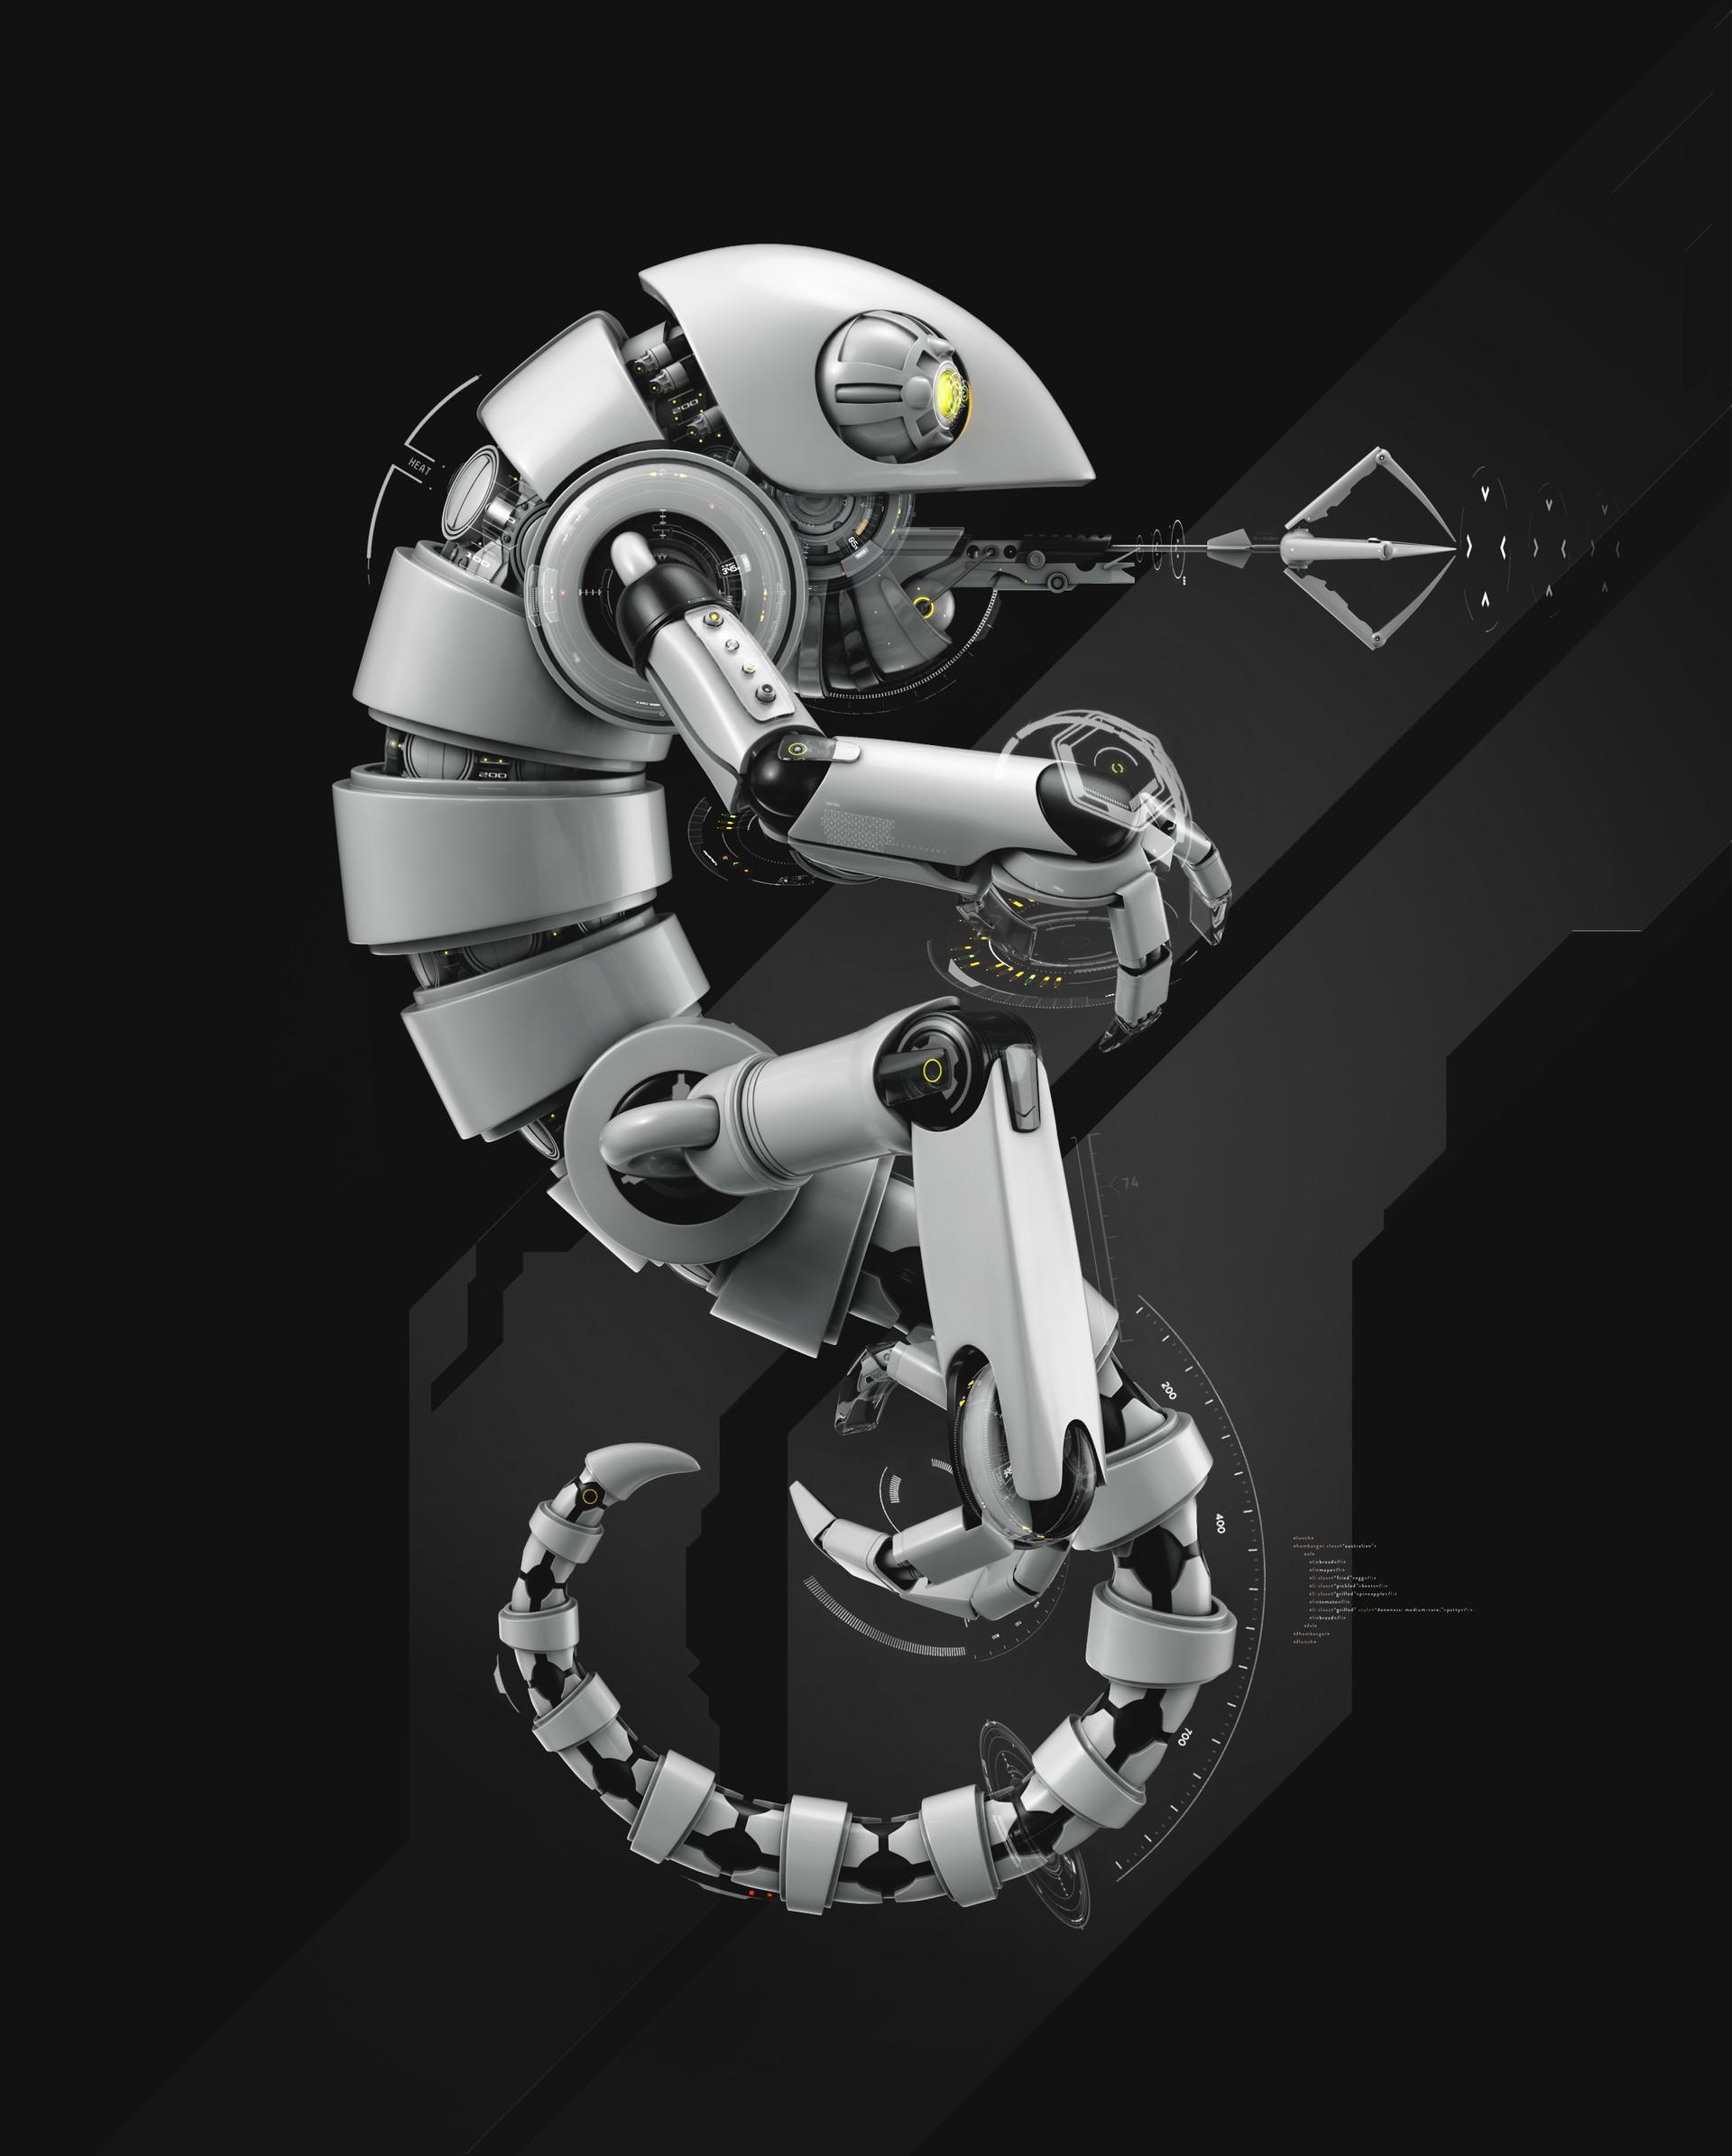 Rakan khamash chameleon robot final